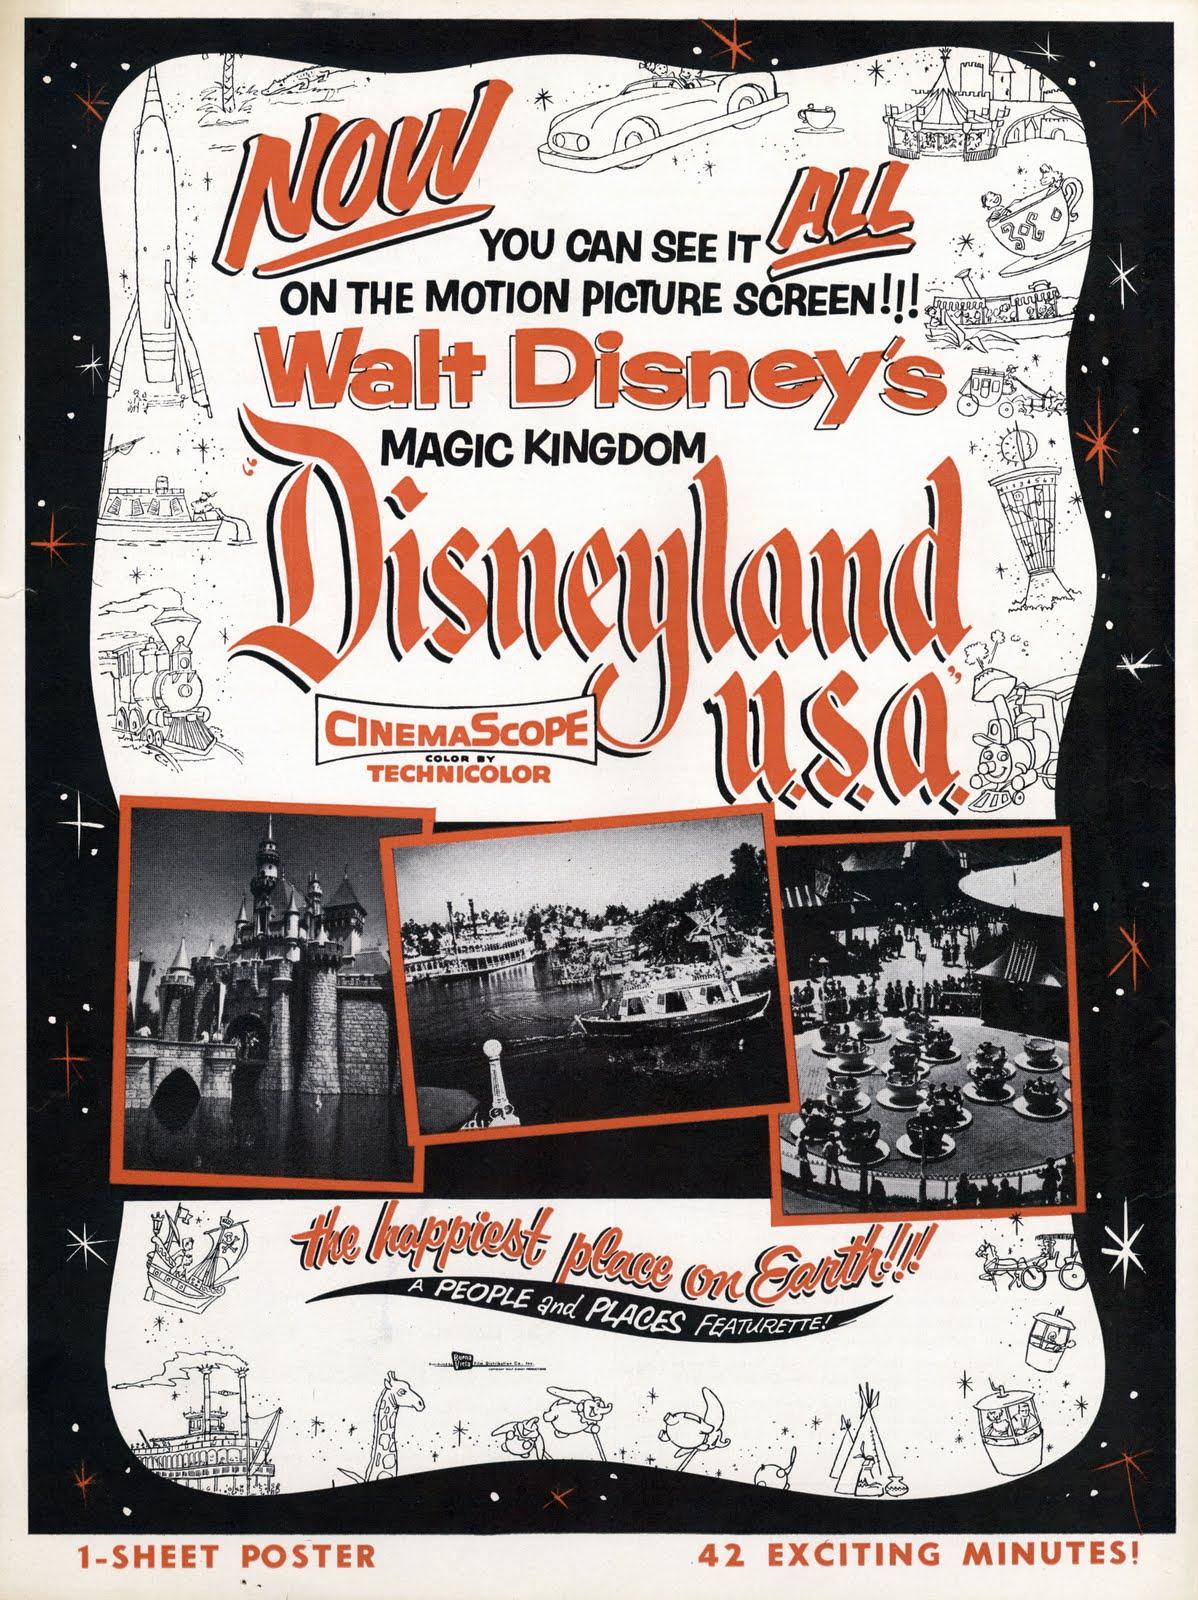 Disneyland, U.S.A.